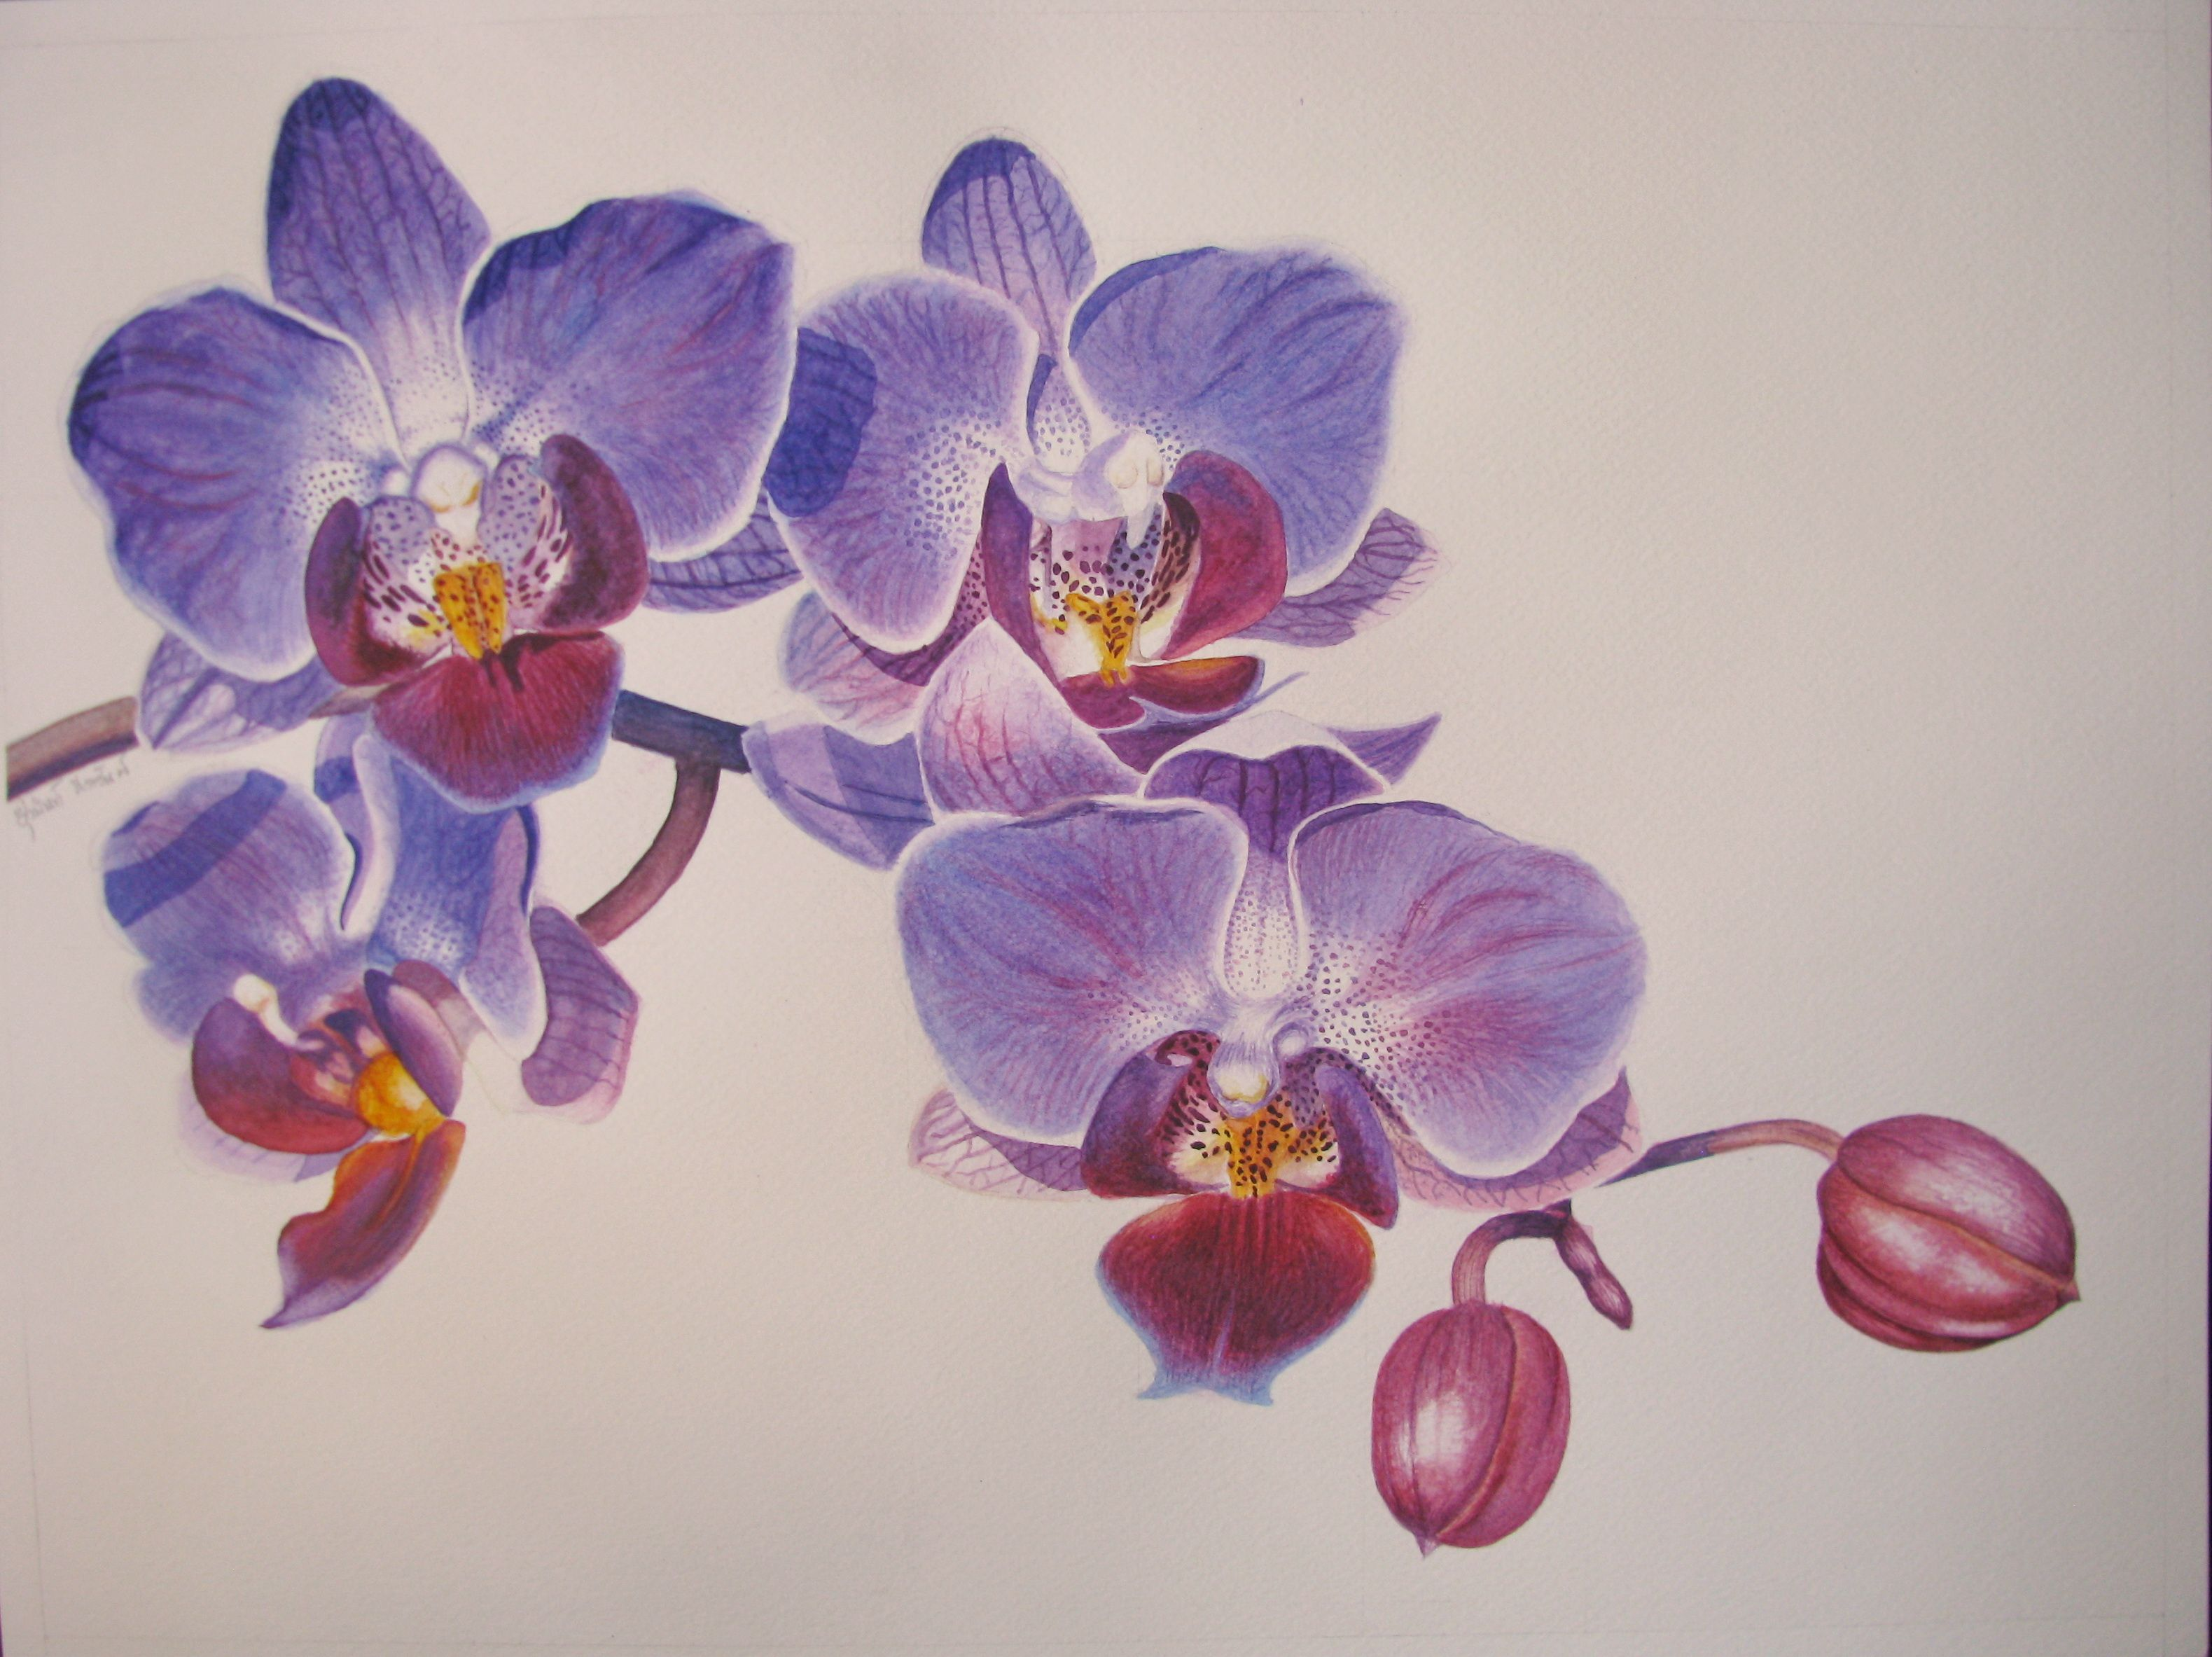 Purple Orchid 14 X 19 In Watercolor Paper Artist Yuwanunn Narasun Painting